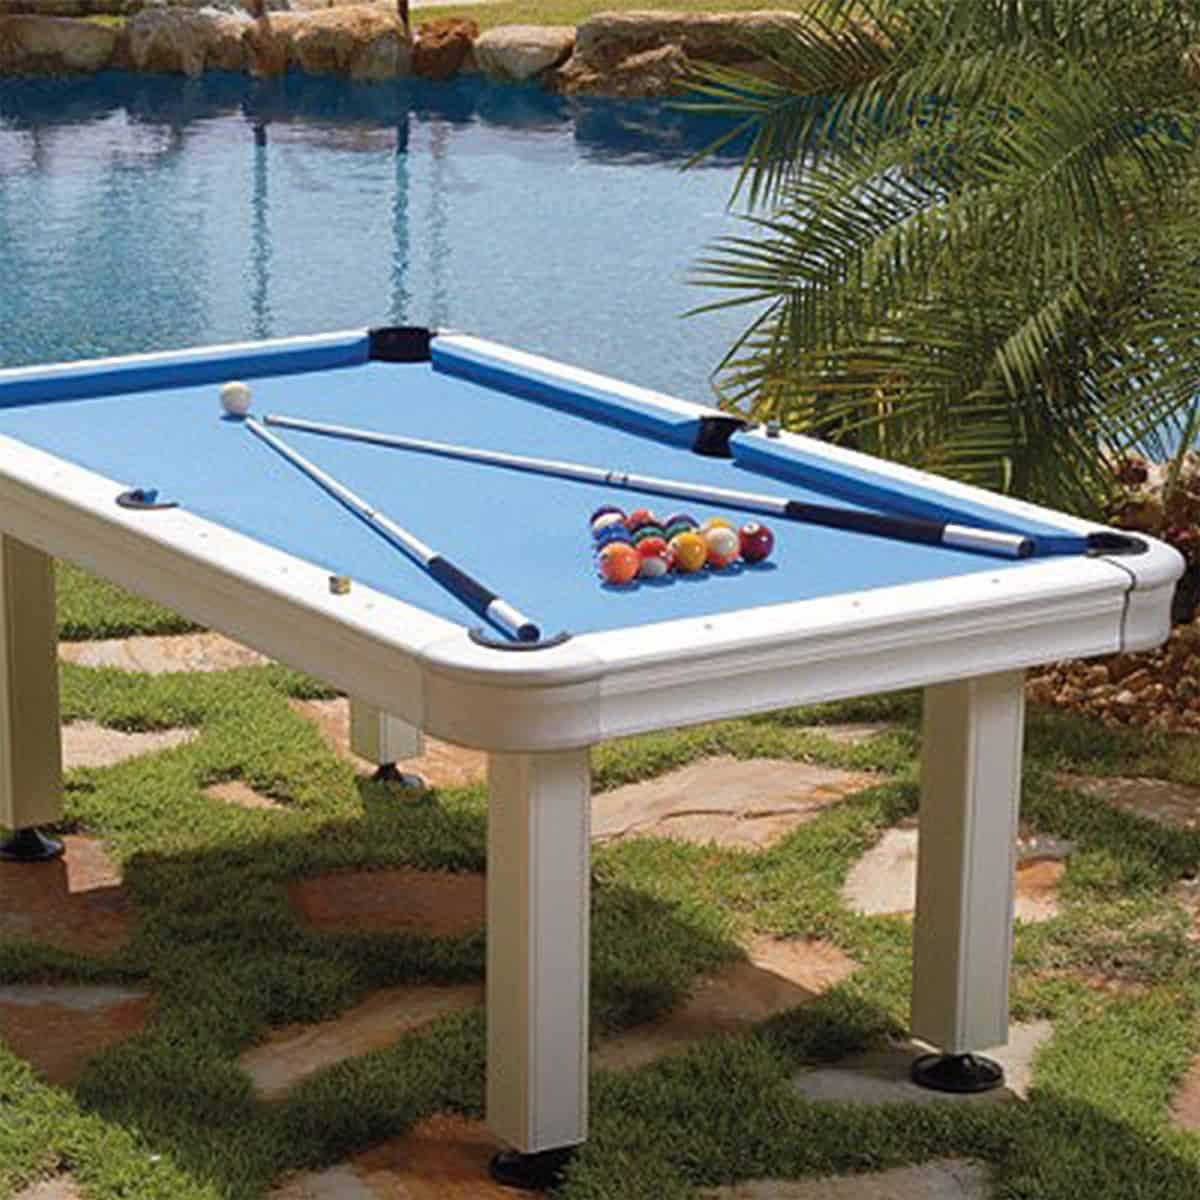 Sensational Imperial 7 Ft Outdoor Pool Table Interior Design Ideas Gentotryabchikinfo